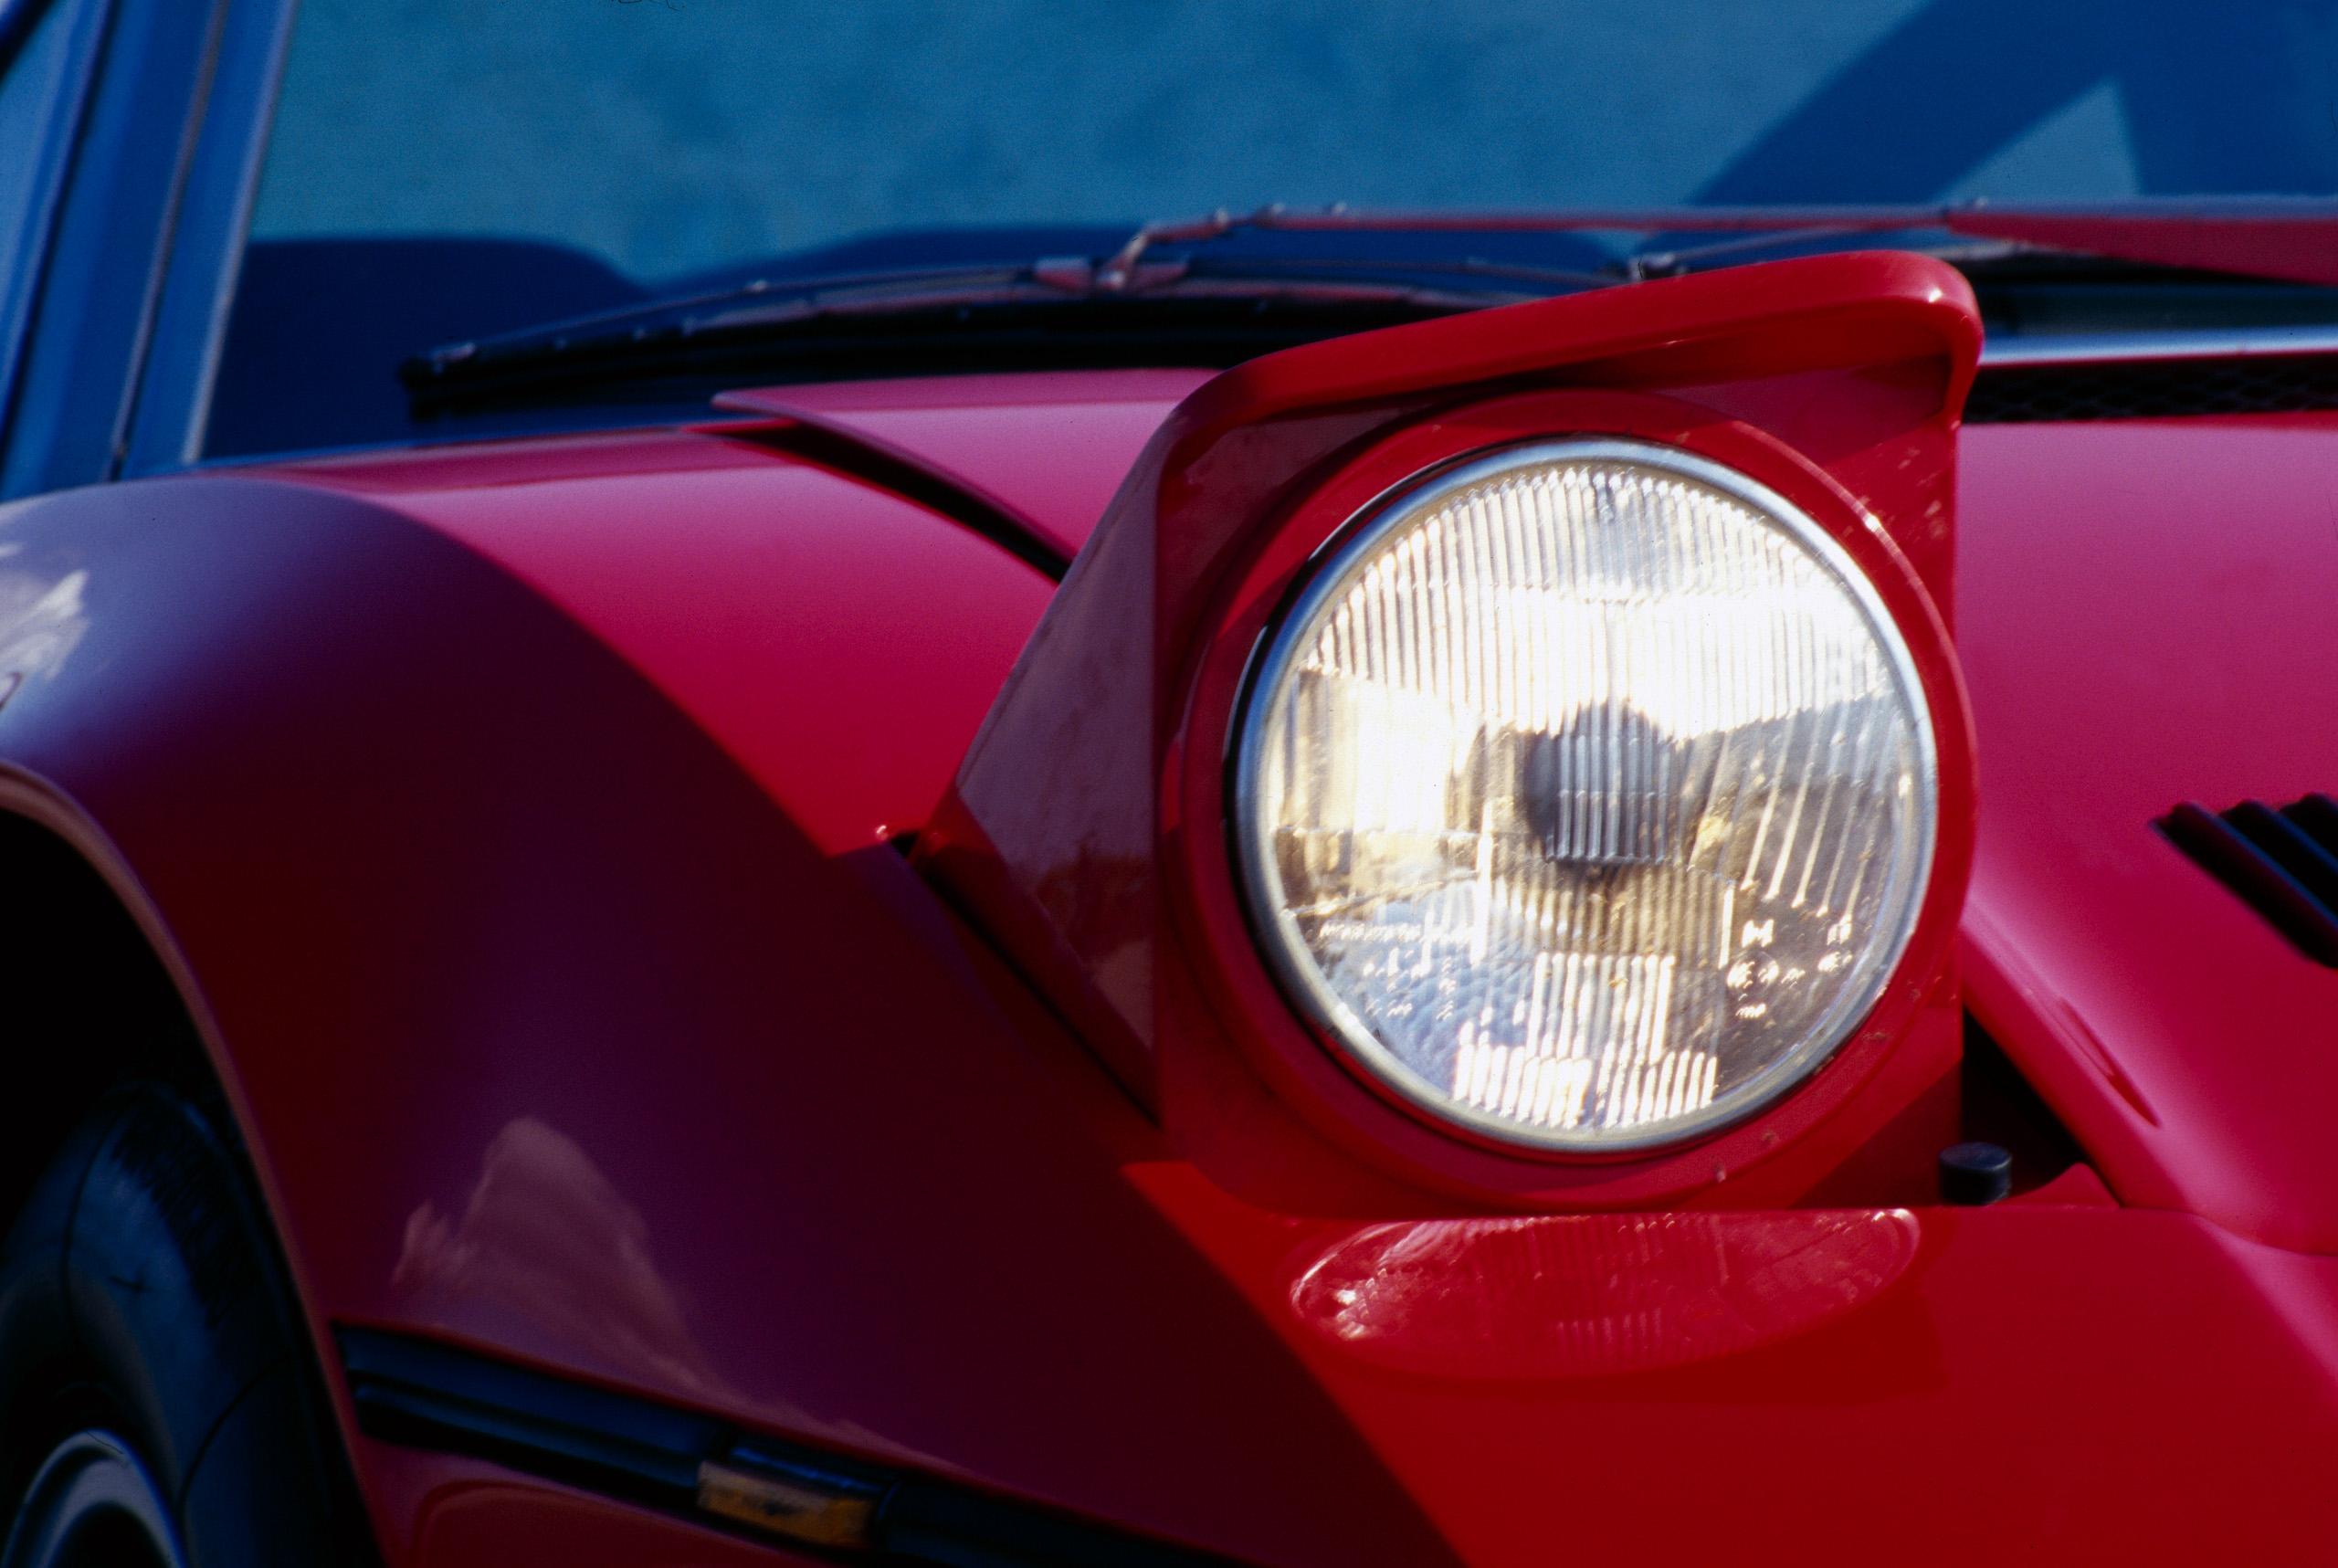 Maserati Bora headlight close